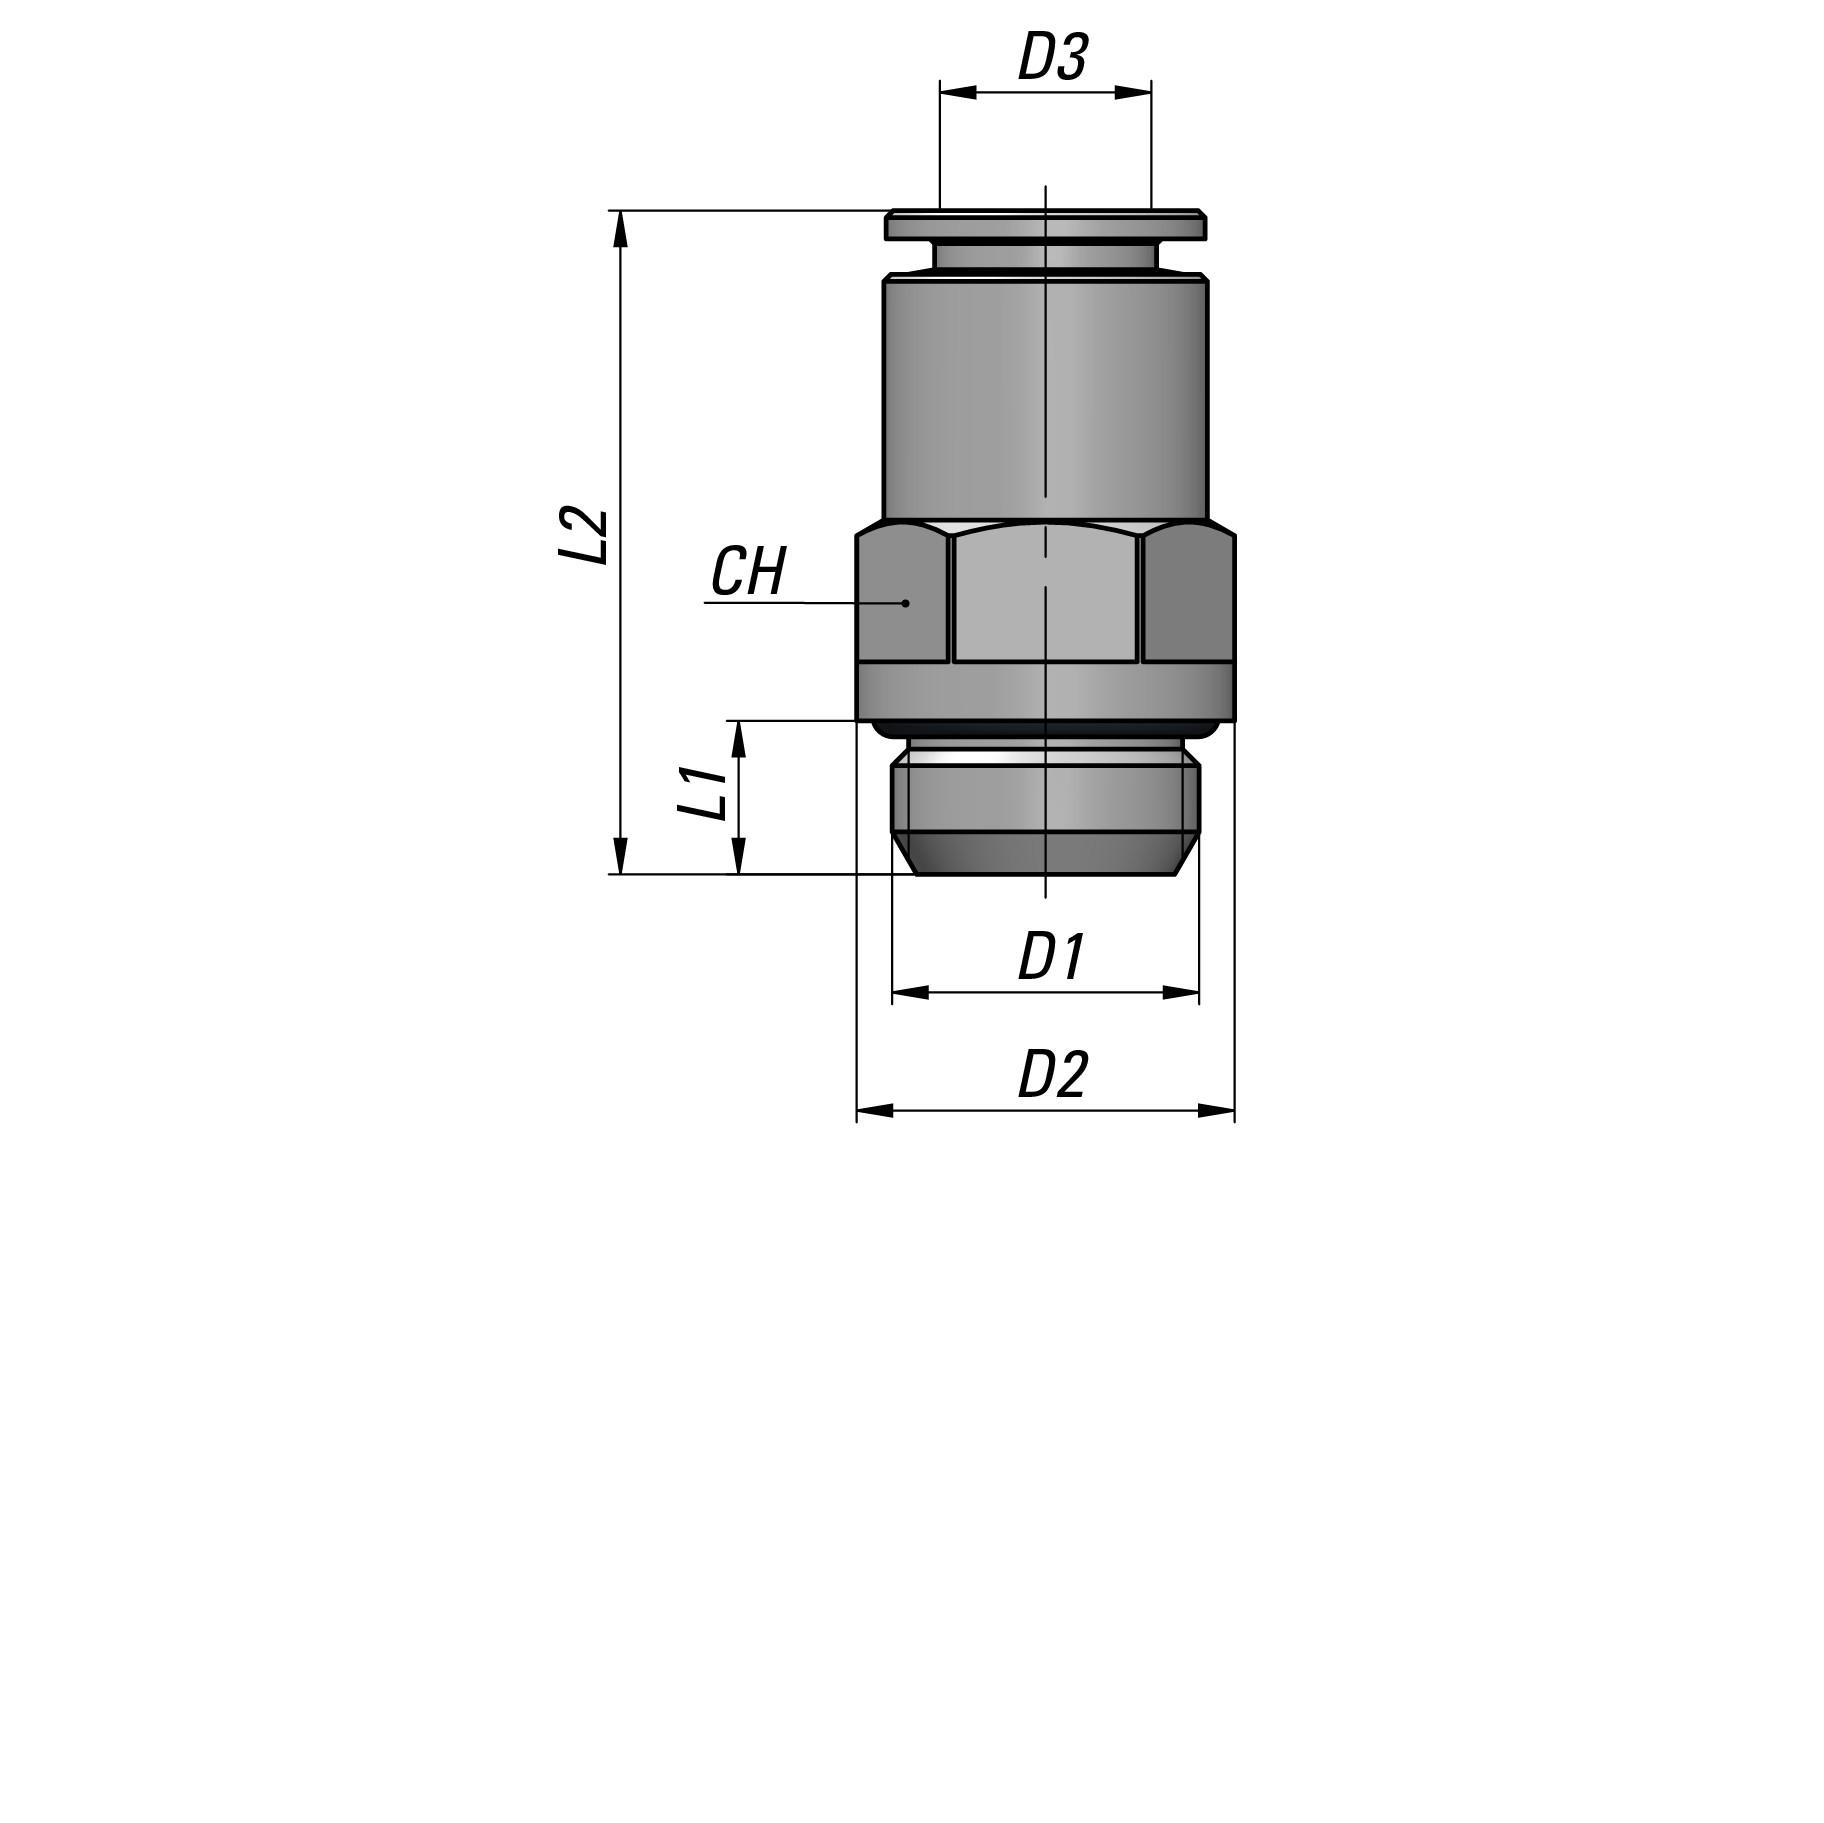 MV55 06 18